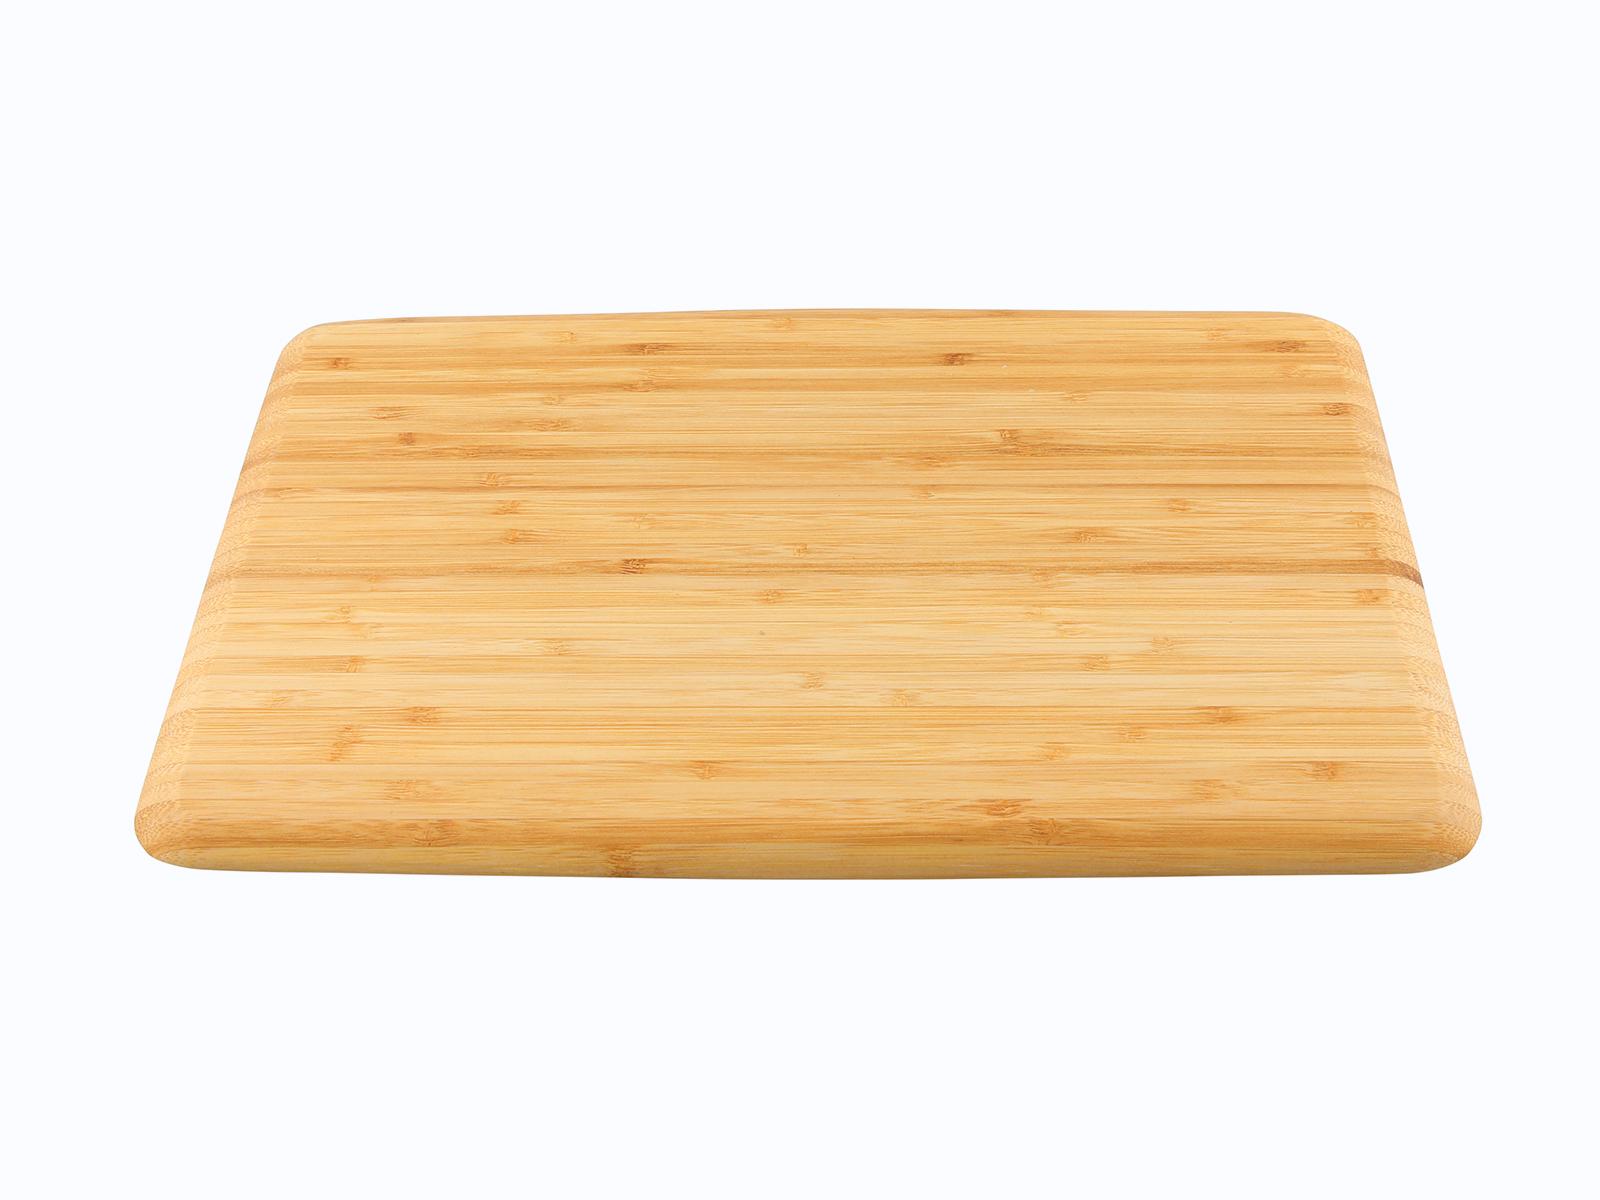 Servierbrett Bambus 25x35x1.5cm